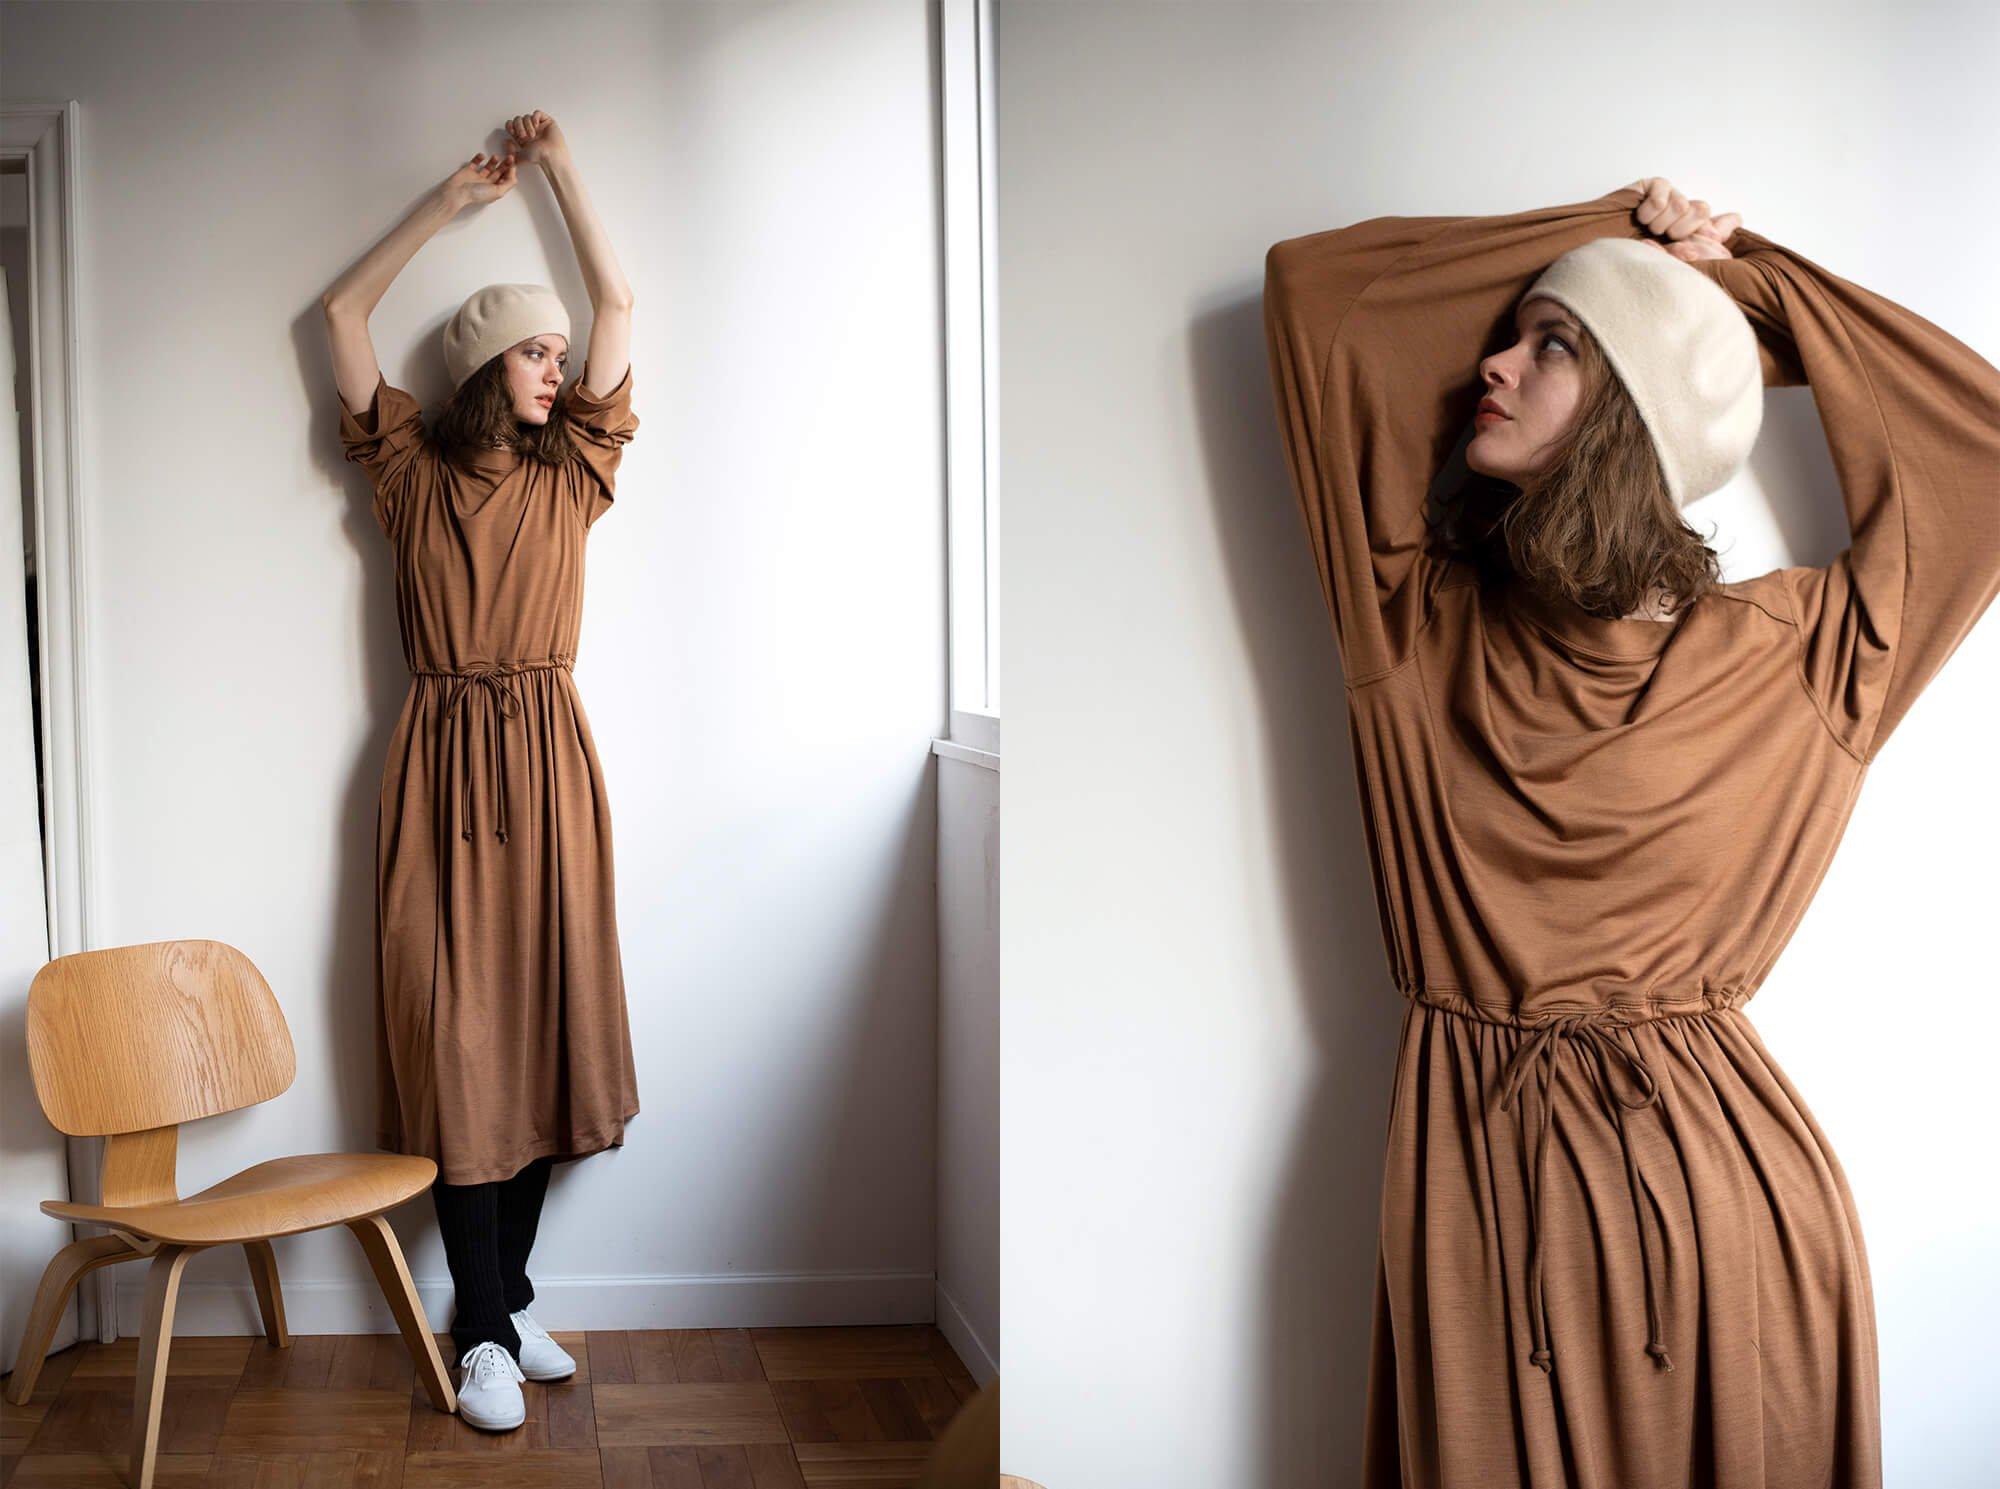 superfine merino-jersey gathered dress